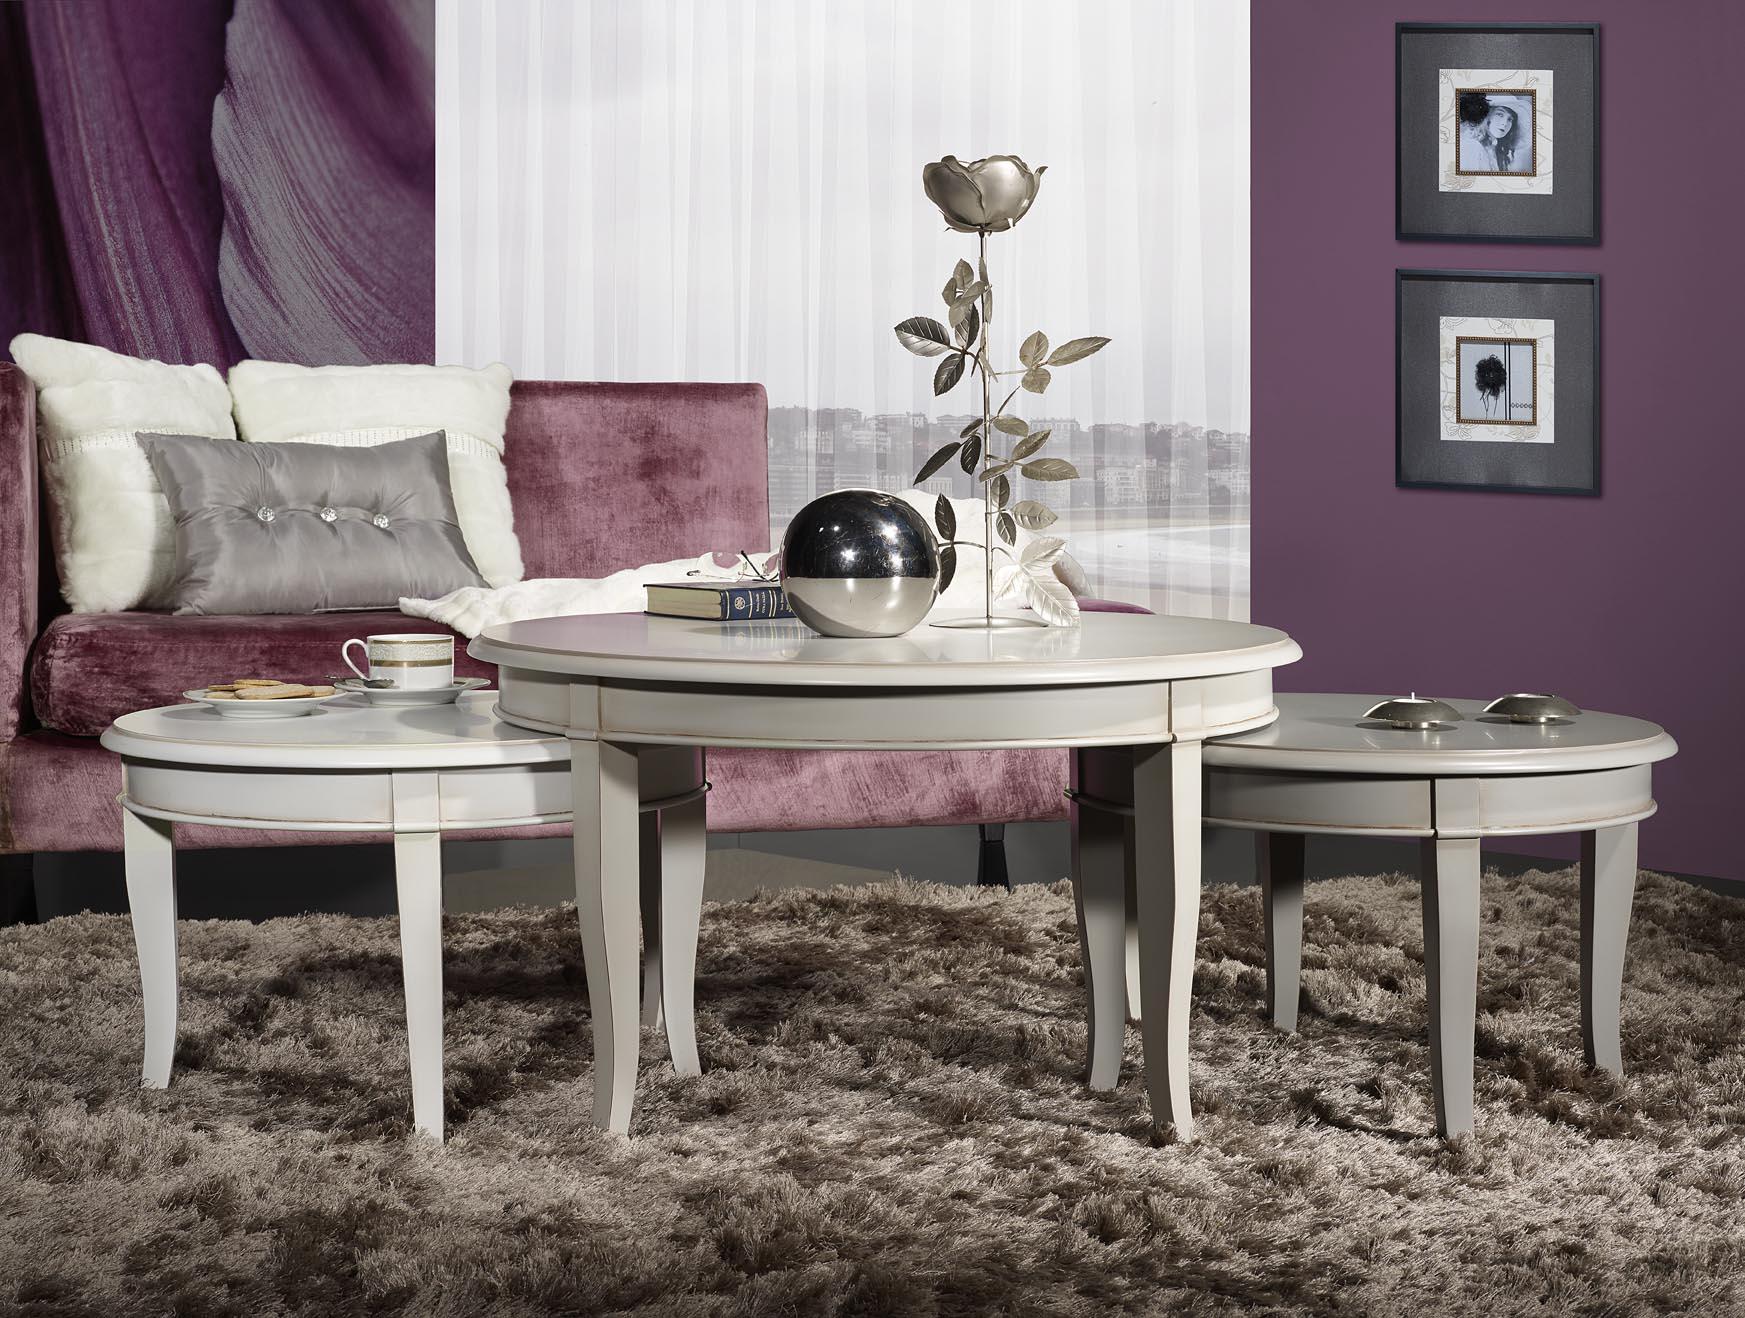 set de 3 tables basses rondes en merisier de style. Black Bedroom Furniture Sets. Home Design Ideas